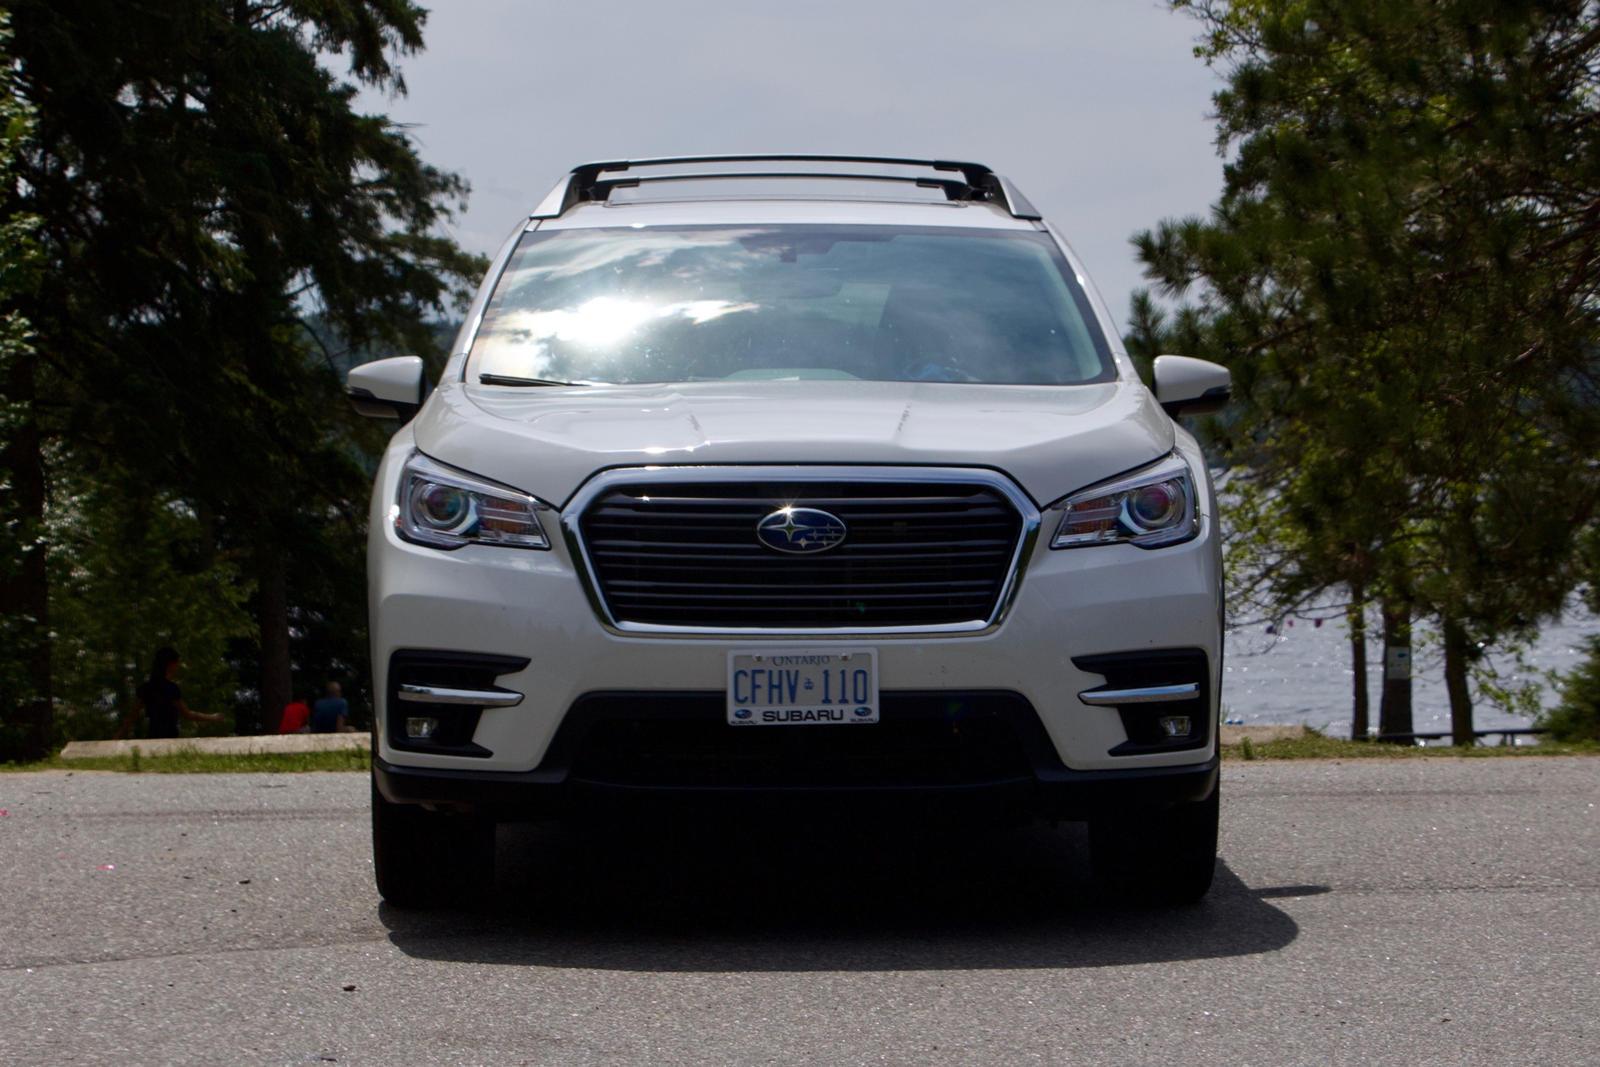 1360 2019 Subaru Ascent Test Drive Review: Huge-aru